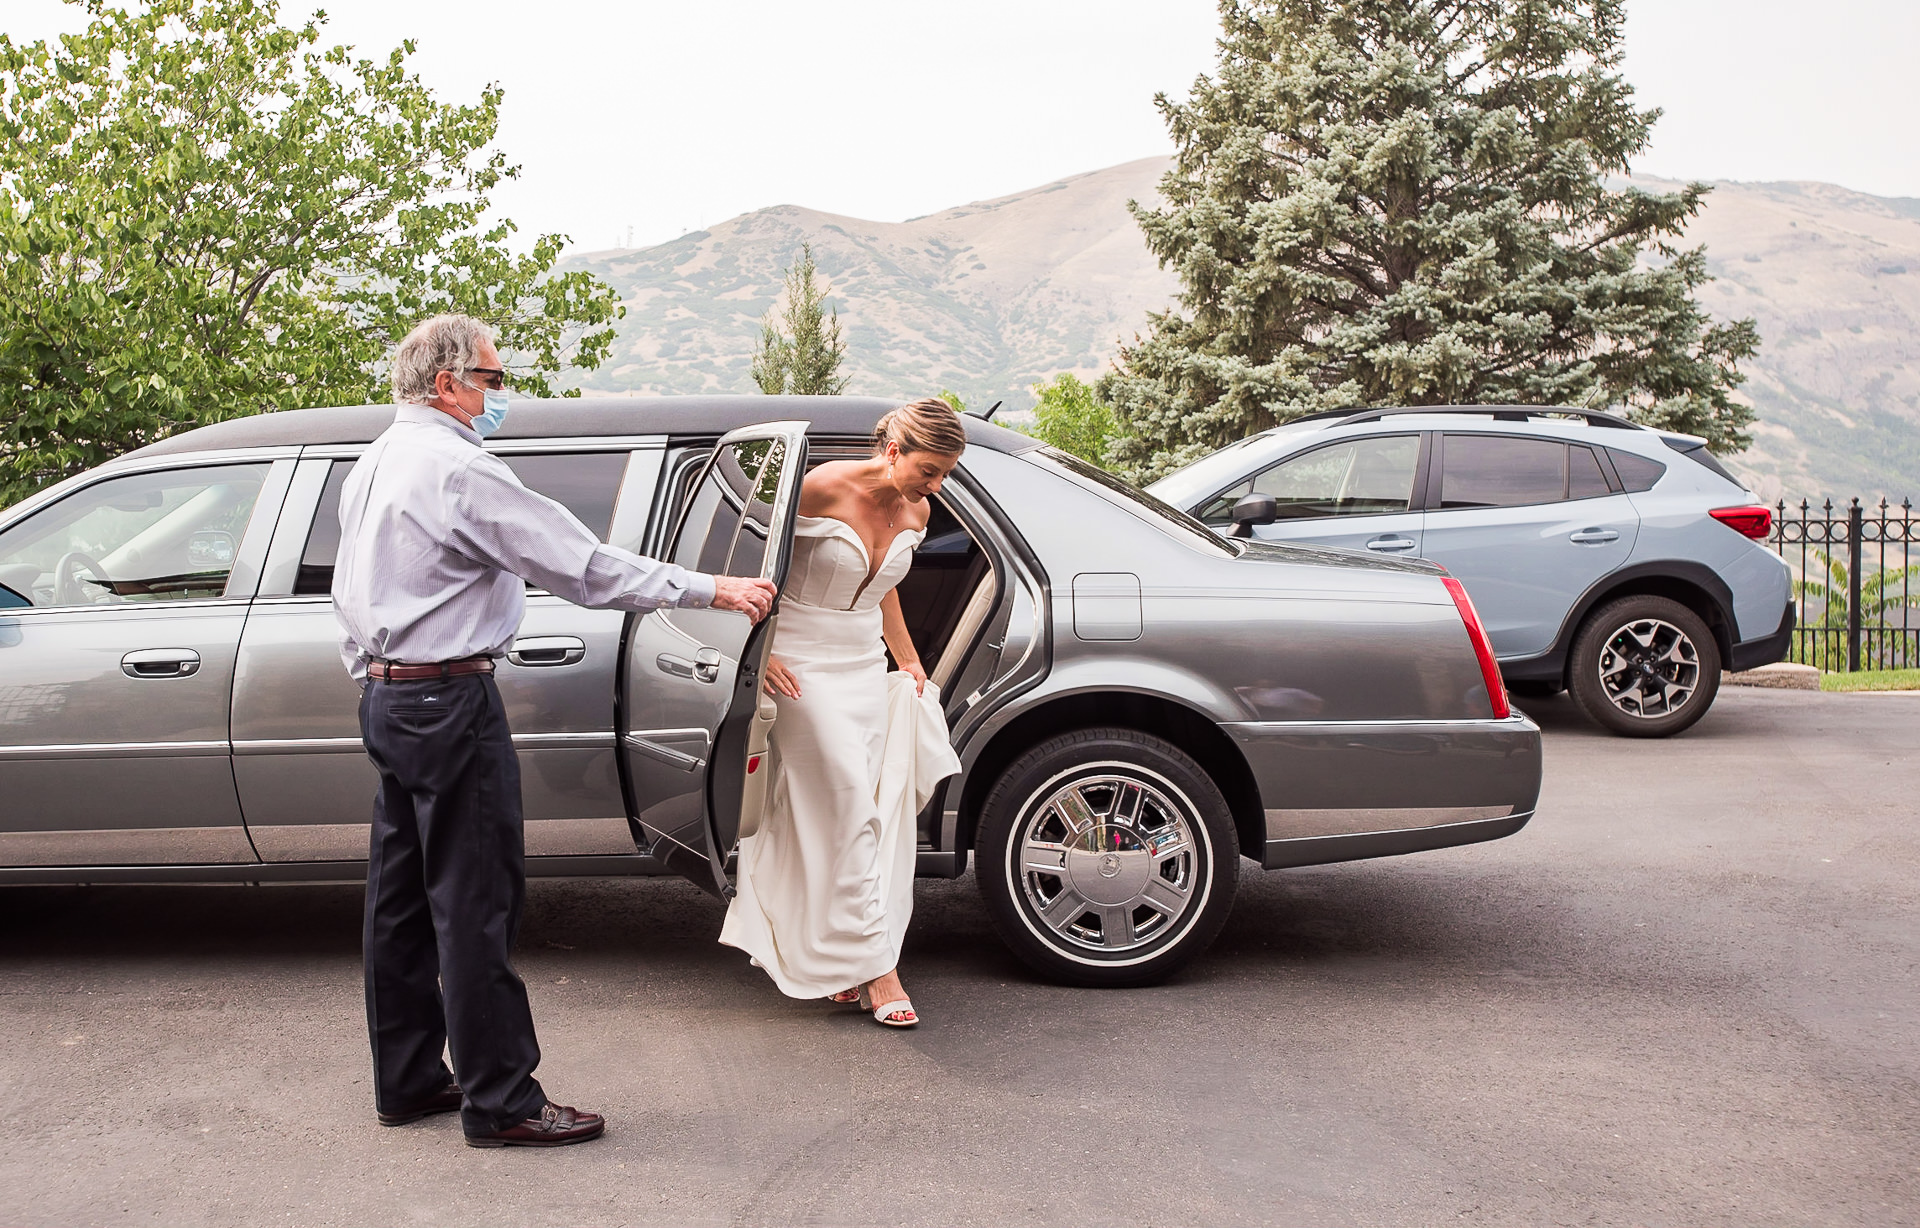 Downtown-Salt-Lake-City-Wedding-324